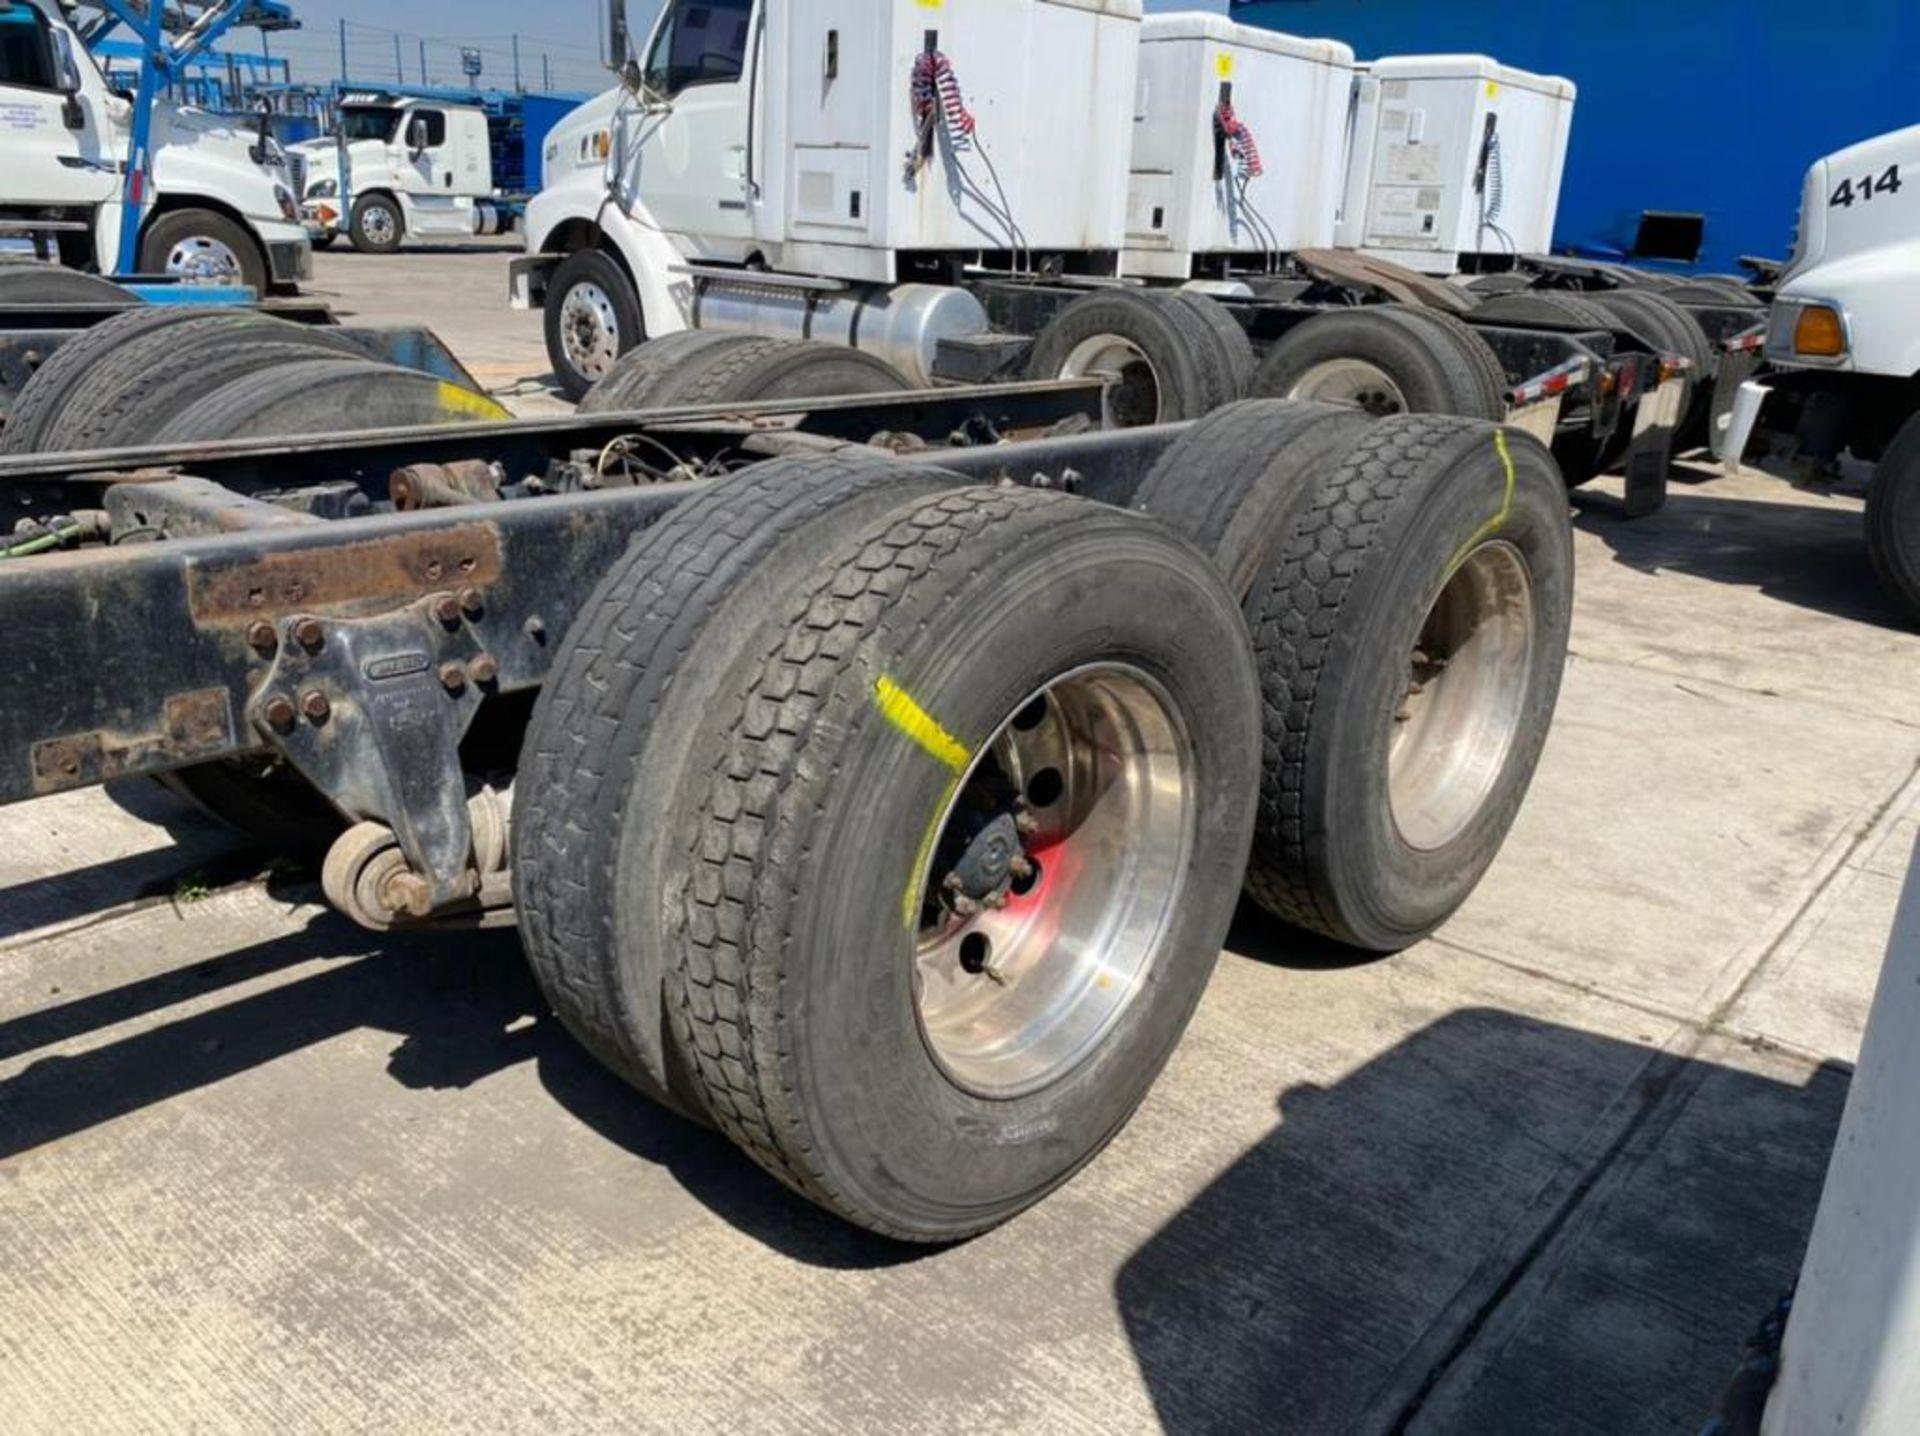 Tractocamión Marca STERLING, LT9500, Modelo 2001 - Image 11 of 27